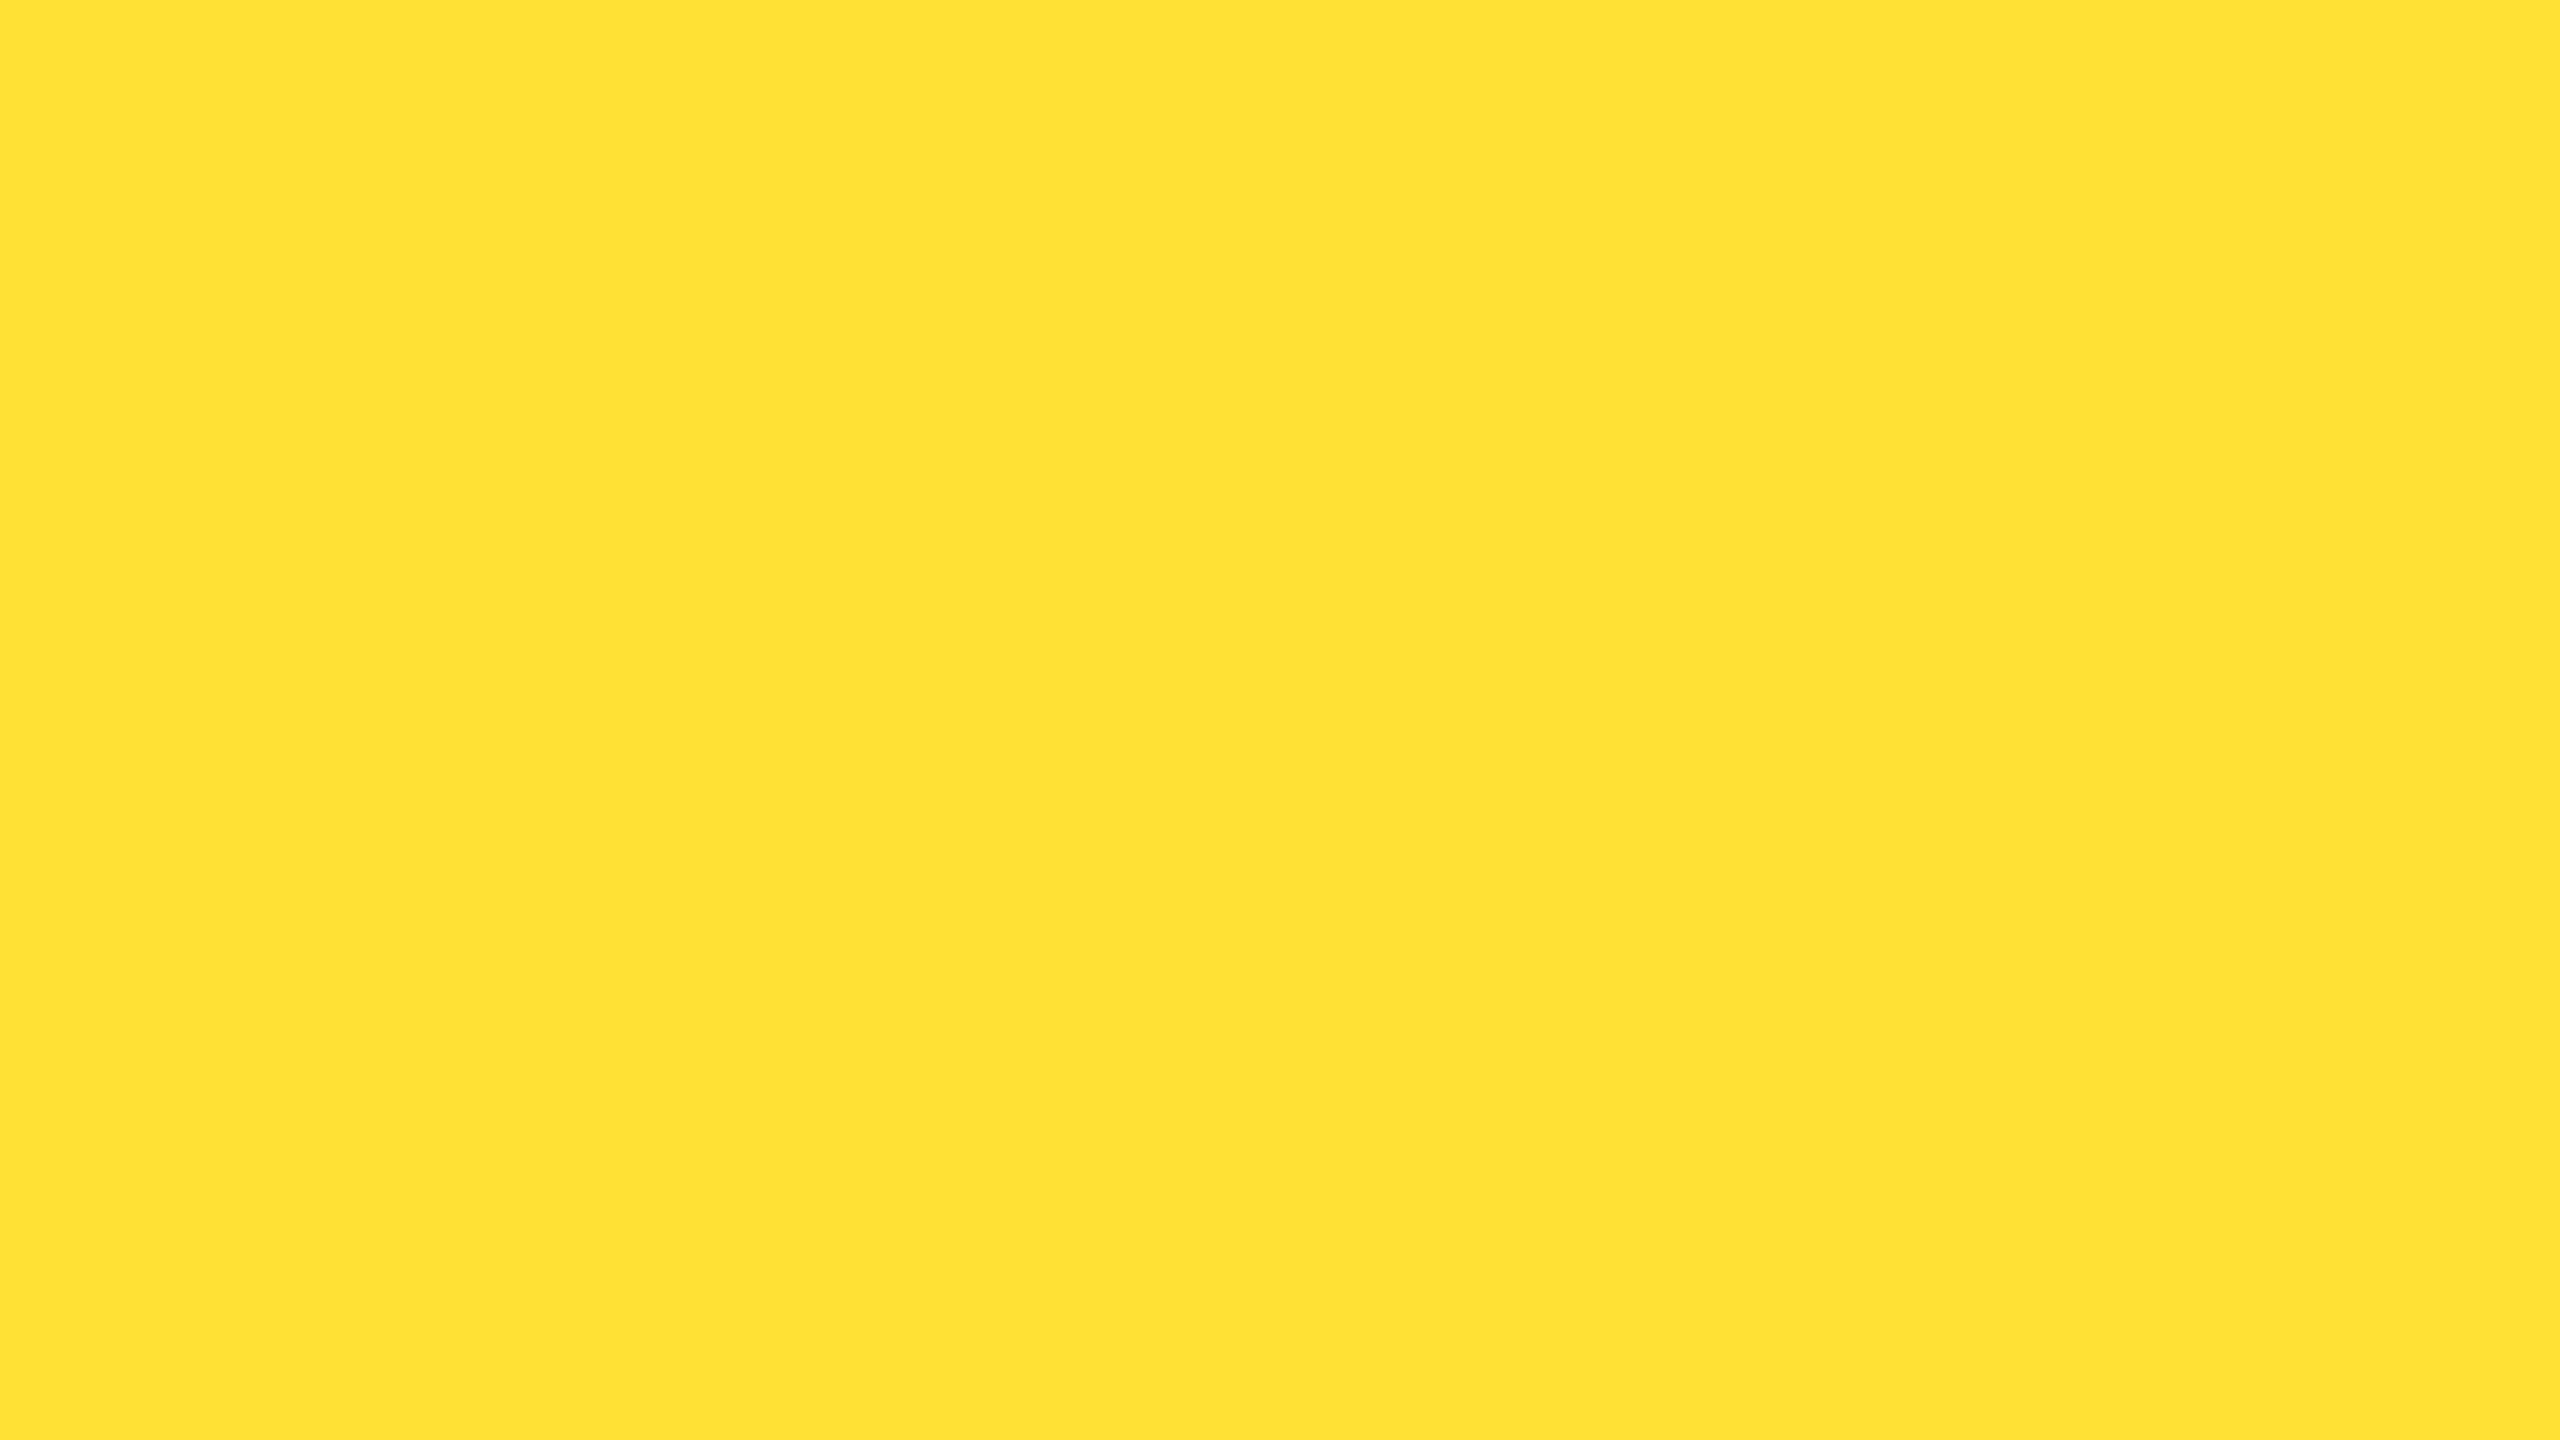 Banana Yellow Solid Colors 2560x1440